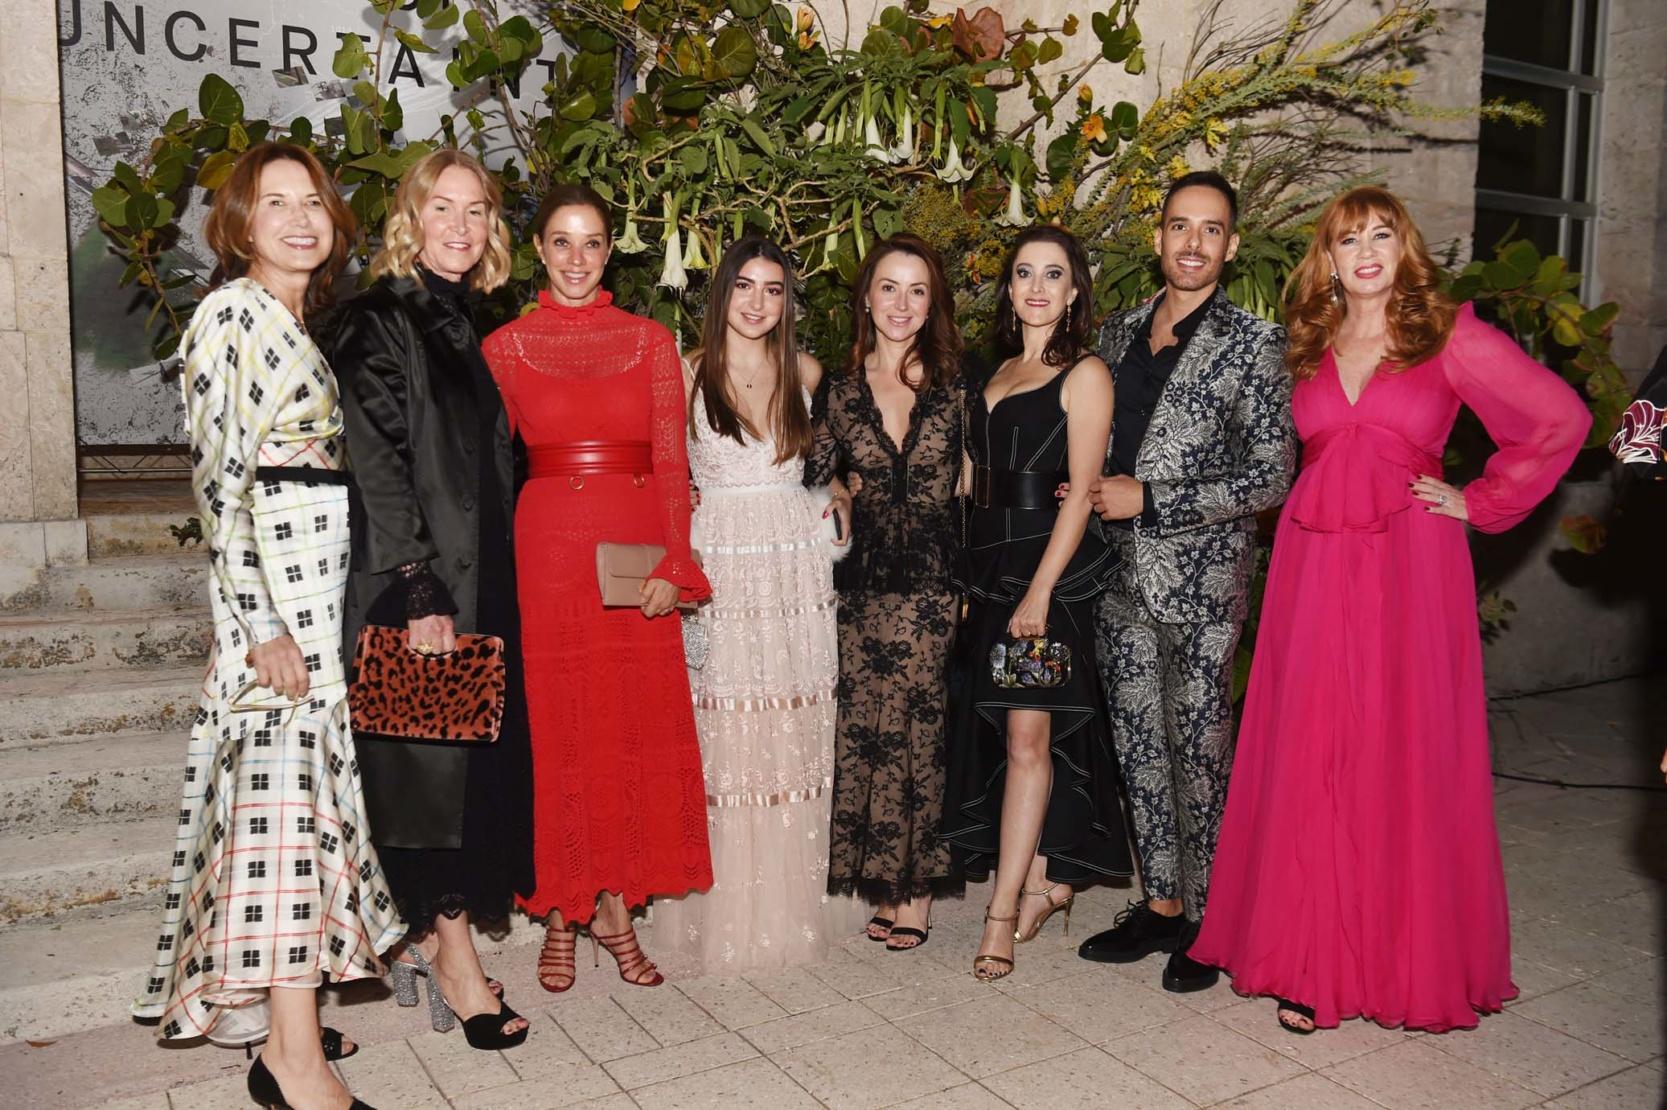 Vivian Pfeiffer, Monica Goldsmith, Alisa Romano, Mia Blavatnik, Olga Blavatnik, Susanne Birbragher, Jose Manrique, Pearl Baker-Katz